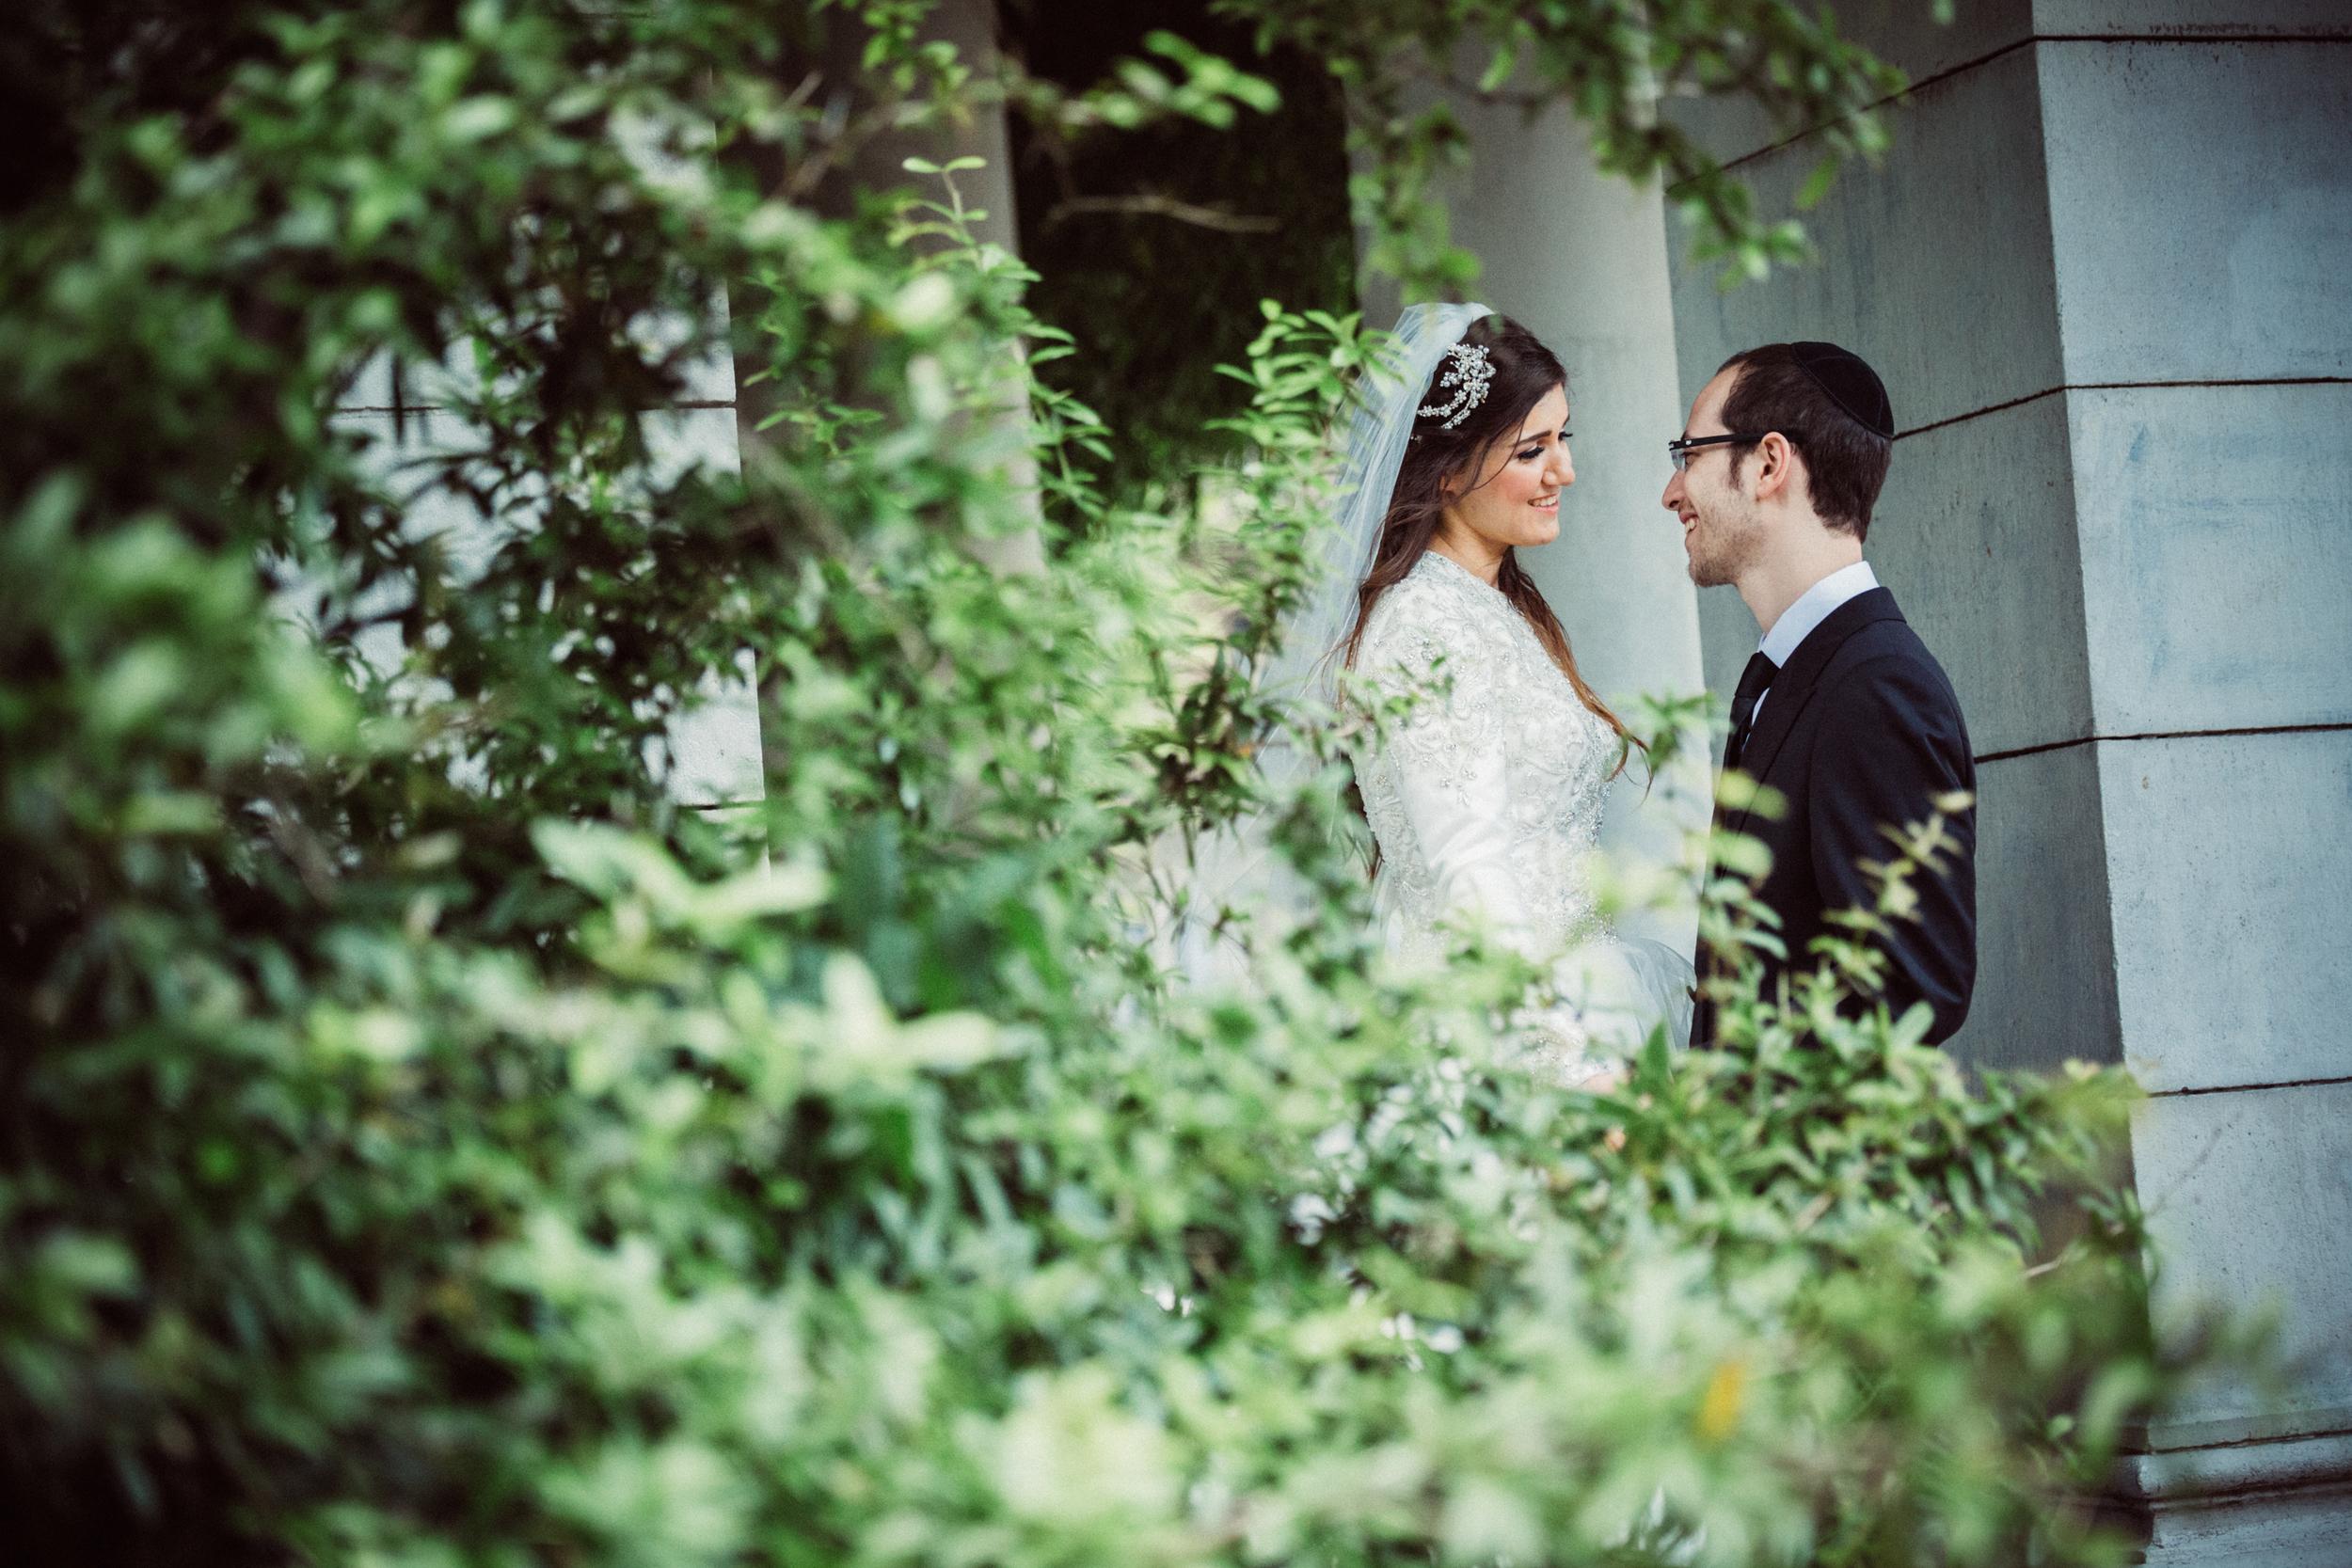 Wedding Iossi and Gitty Khafif  - Eliau Piha studio photography, new york, events, people 770 brooklyn -0736.jpg